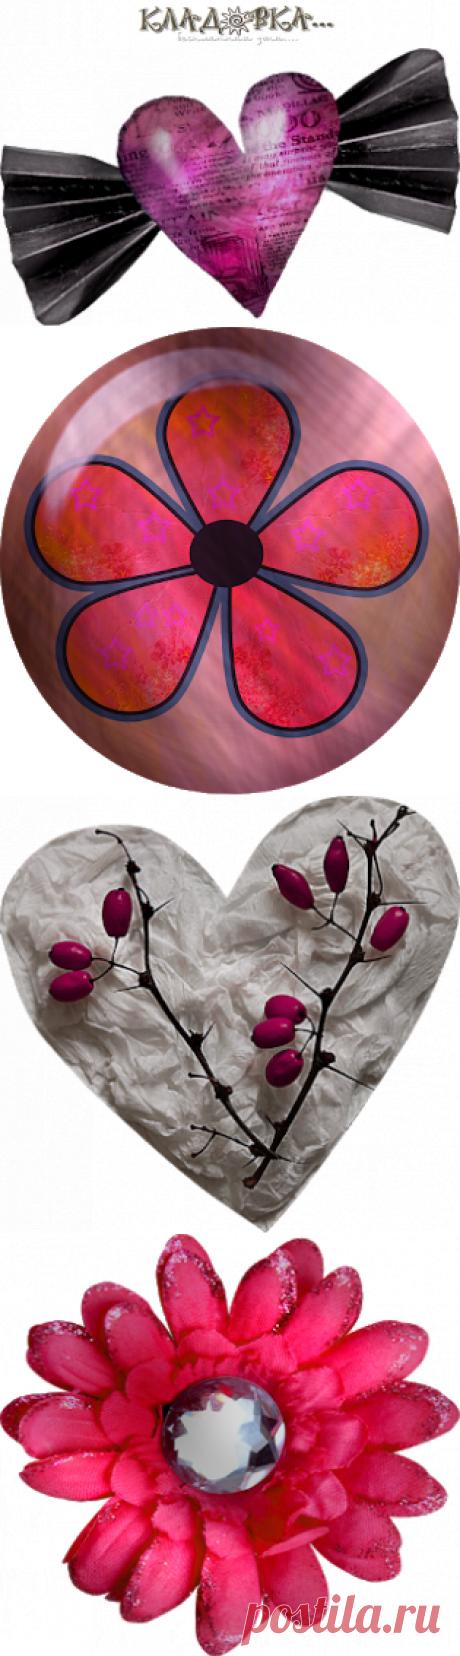 Кладовка...:  I'm in love - я влюбился распакованный скарап-набор для фотошопа png